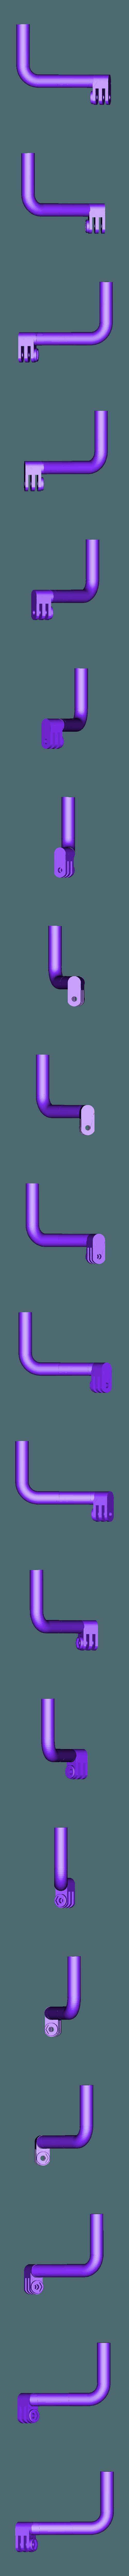 Support__gopro_neva.stl Télécharger fichier STL gratuit Support Gopro Dagoma Neva • Design à imprimer en 3D, BODY3D